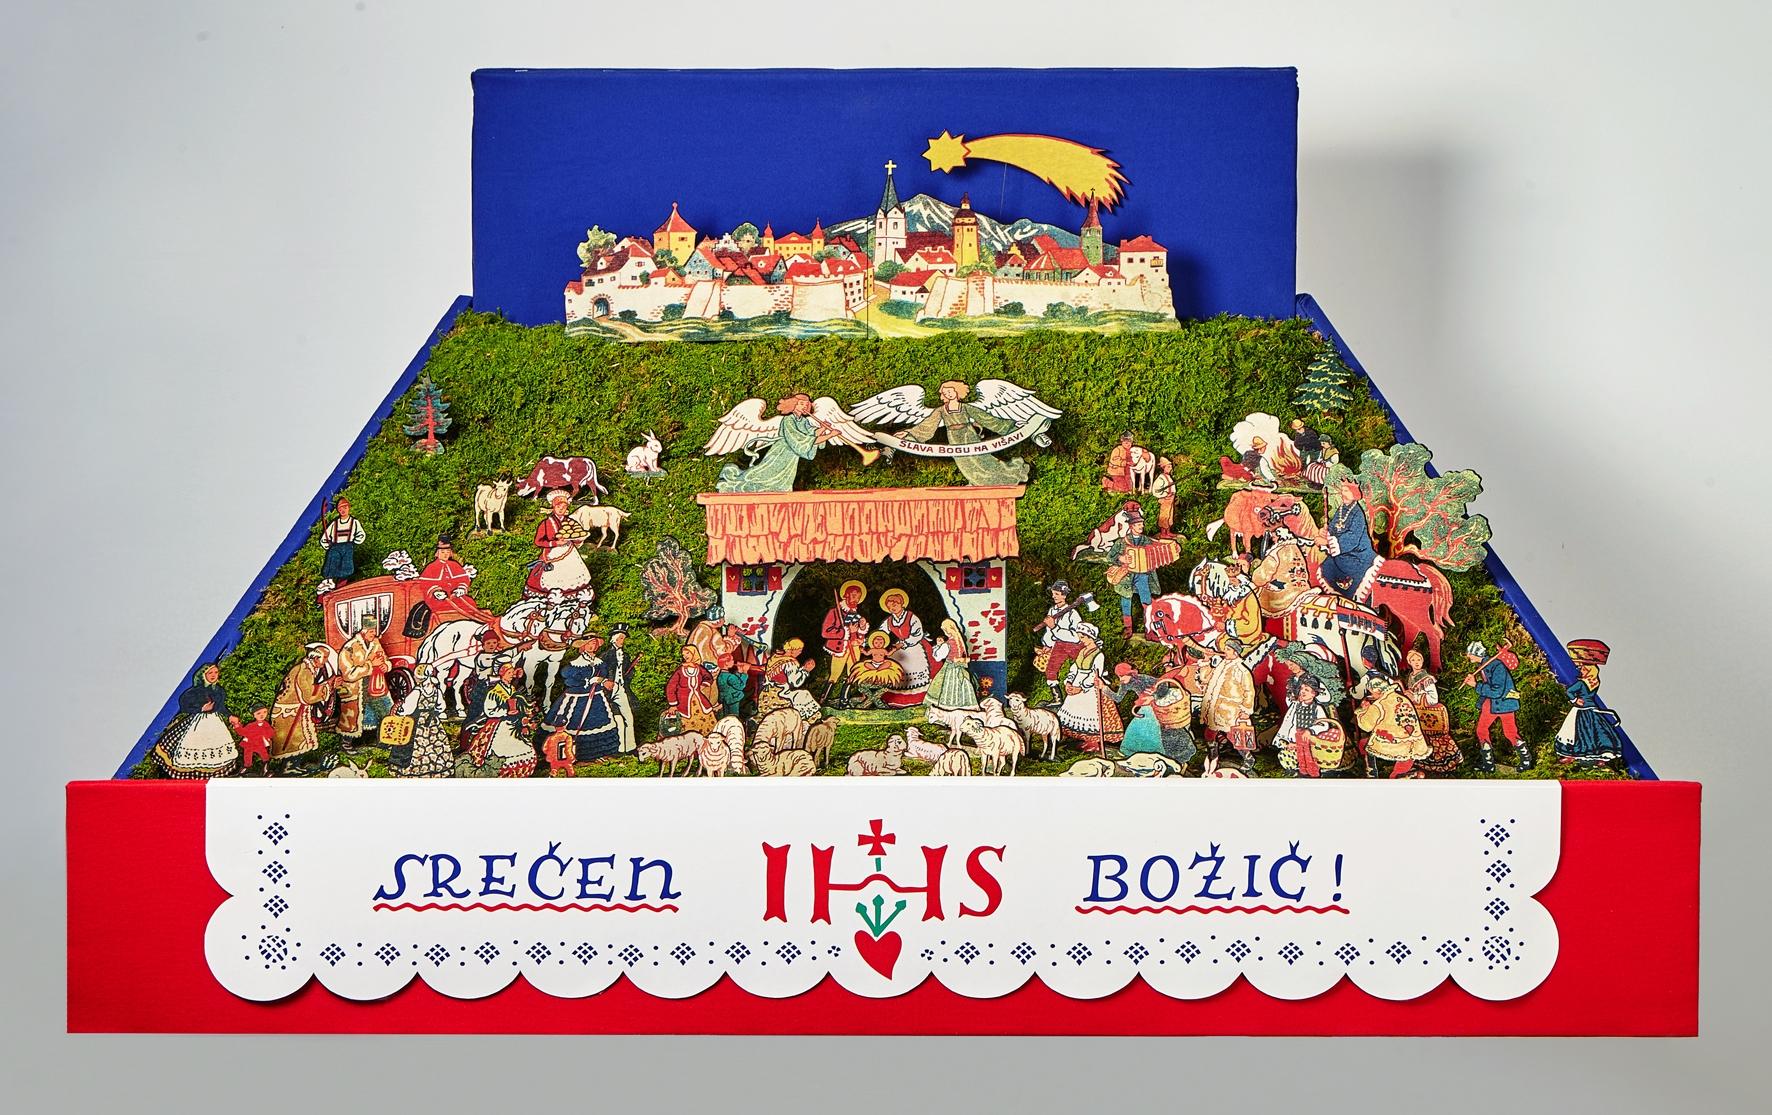 Gasparijeve jaslice narejene 12 2015 foto Matjaž Žnidaršič - Arhiv razstave